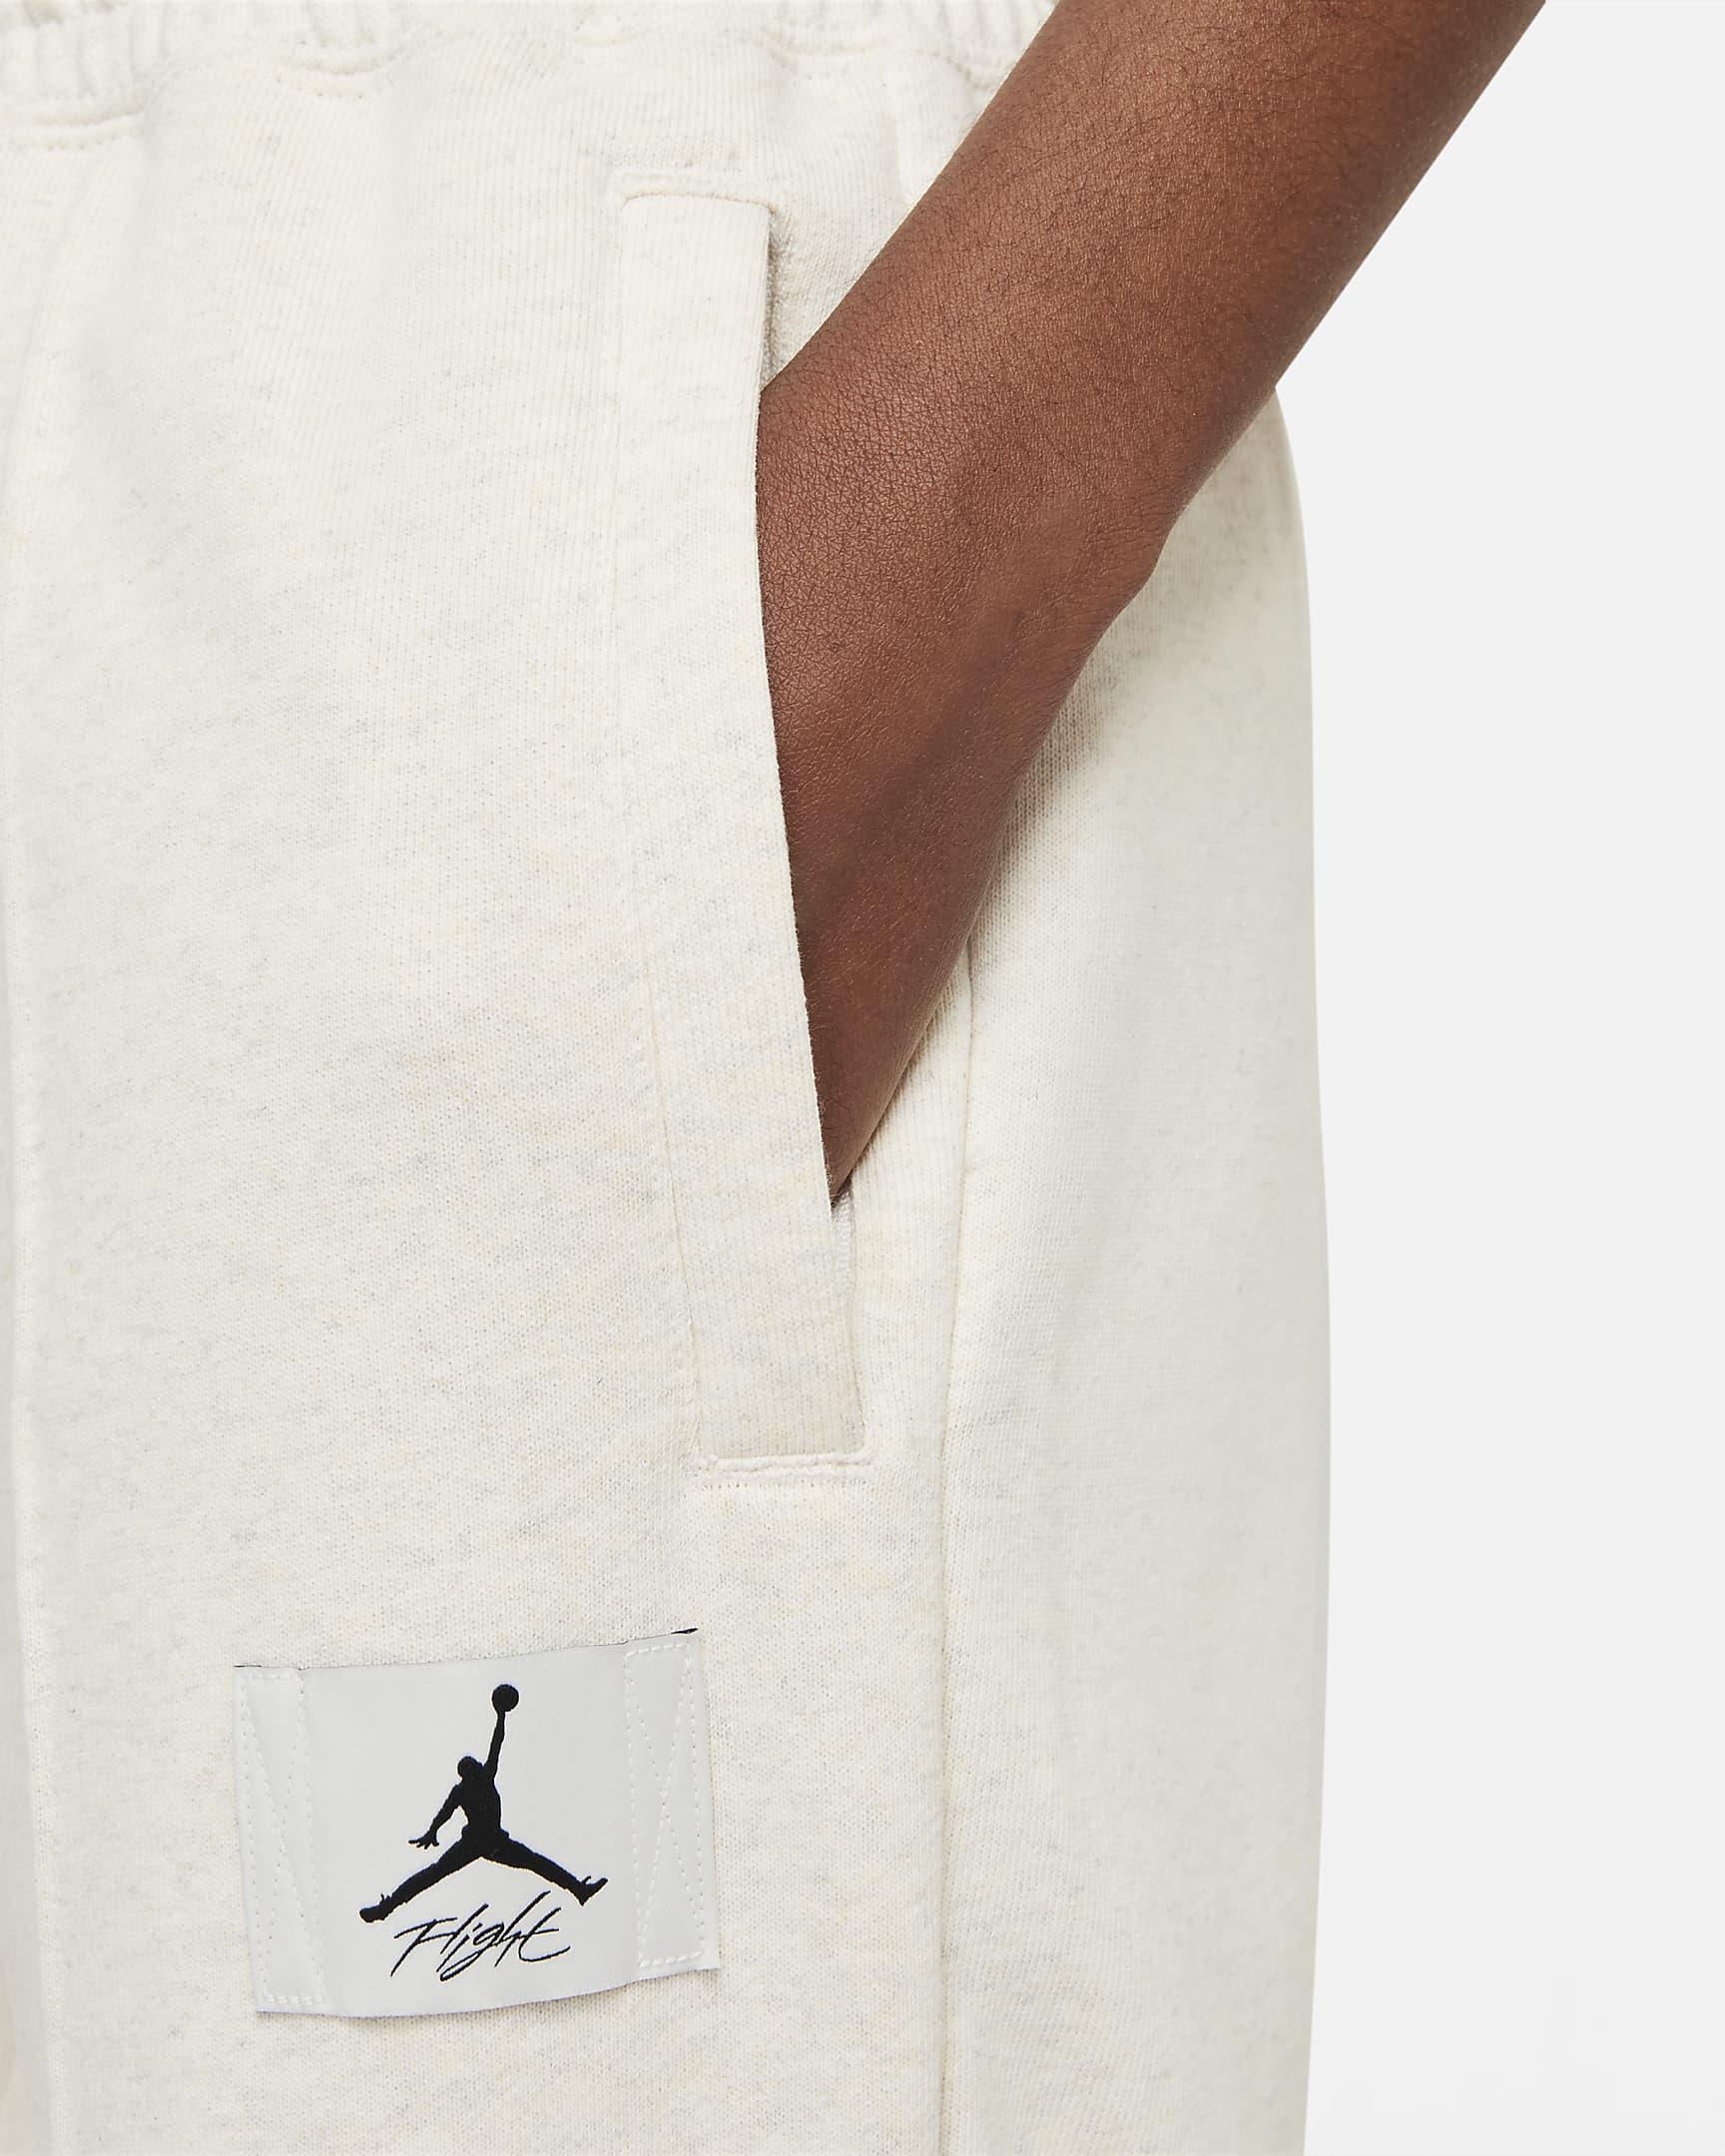 jordan-essentials-womens-fleece-pants-Hf4lN3-1.png